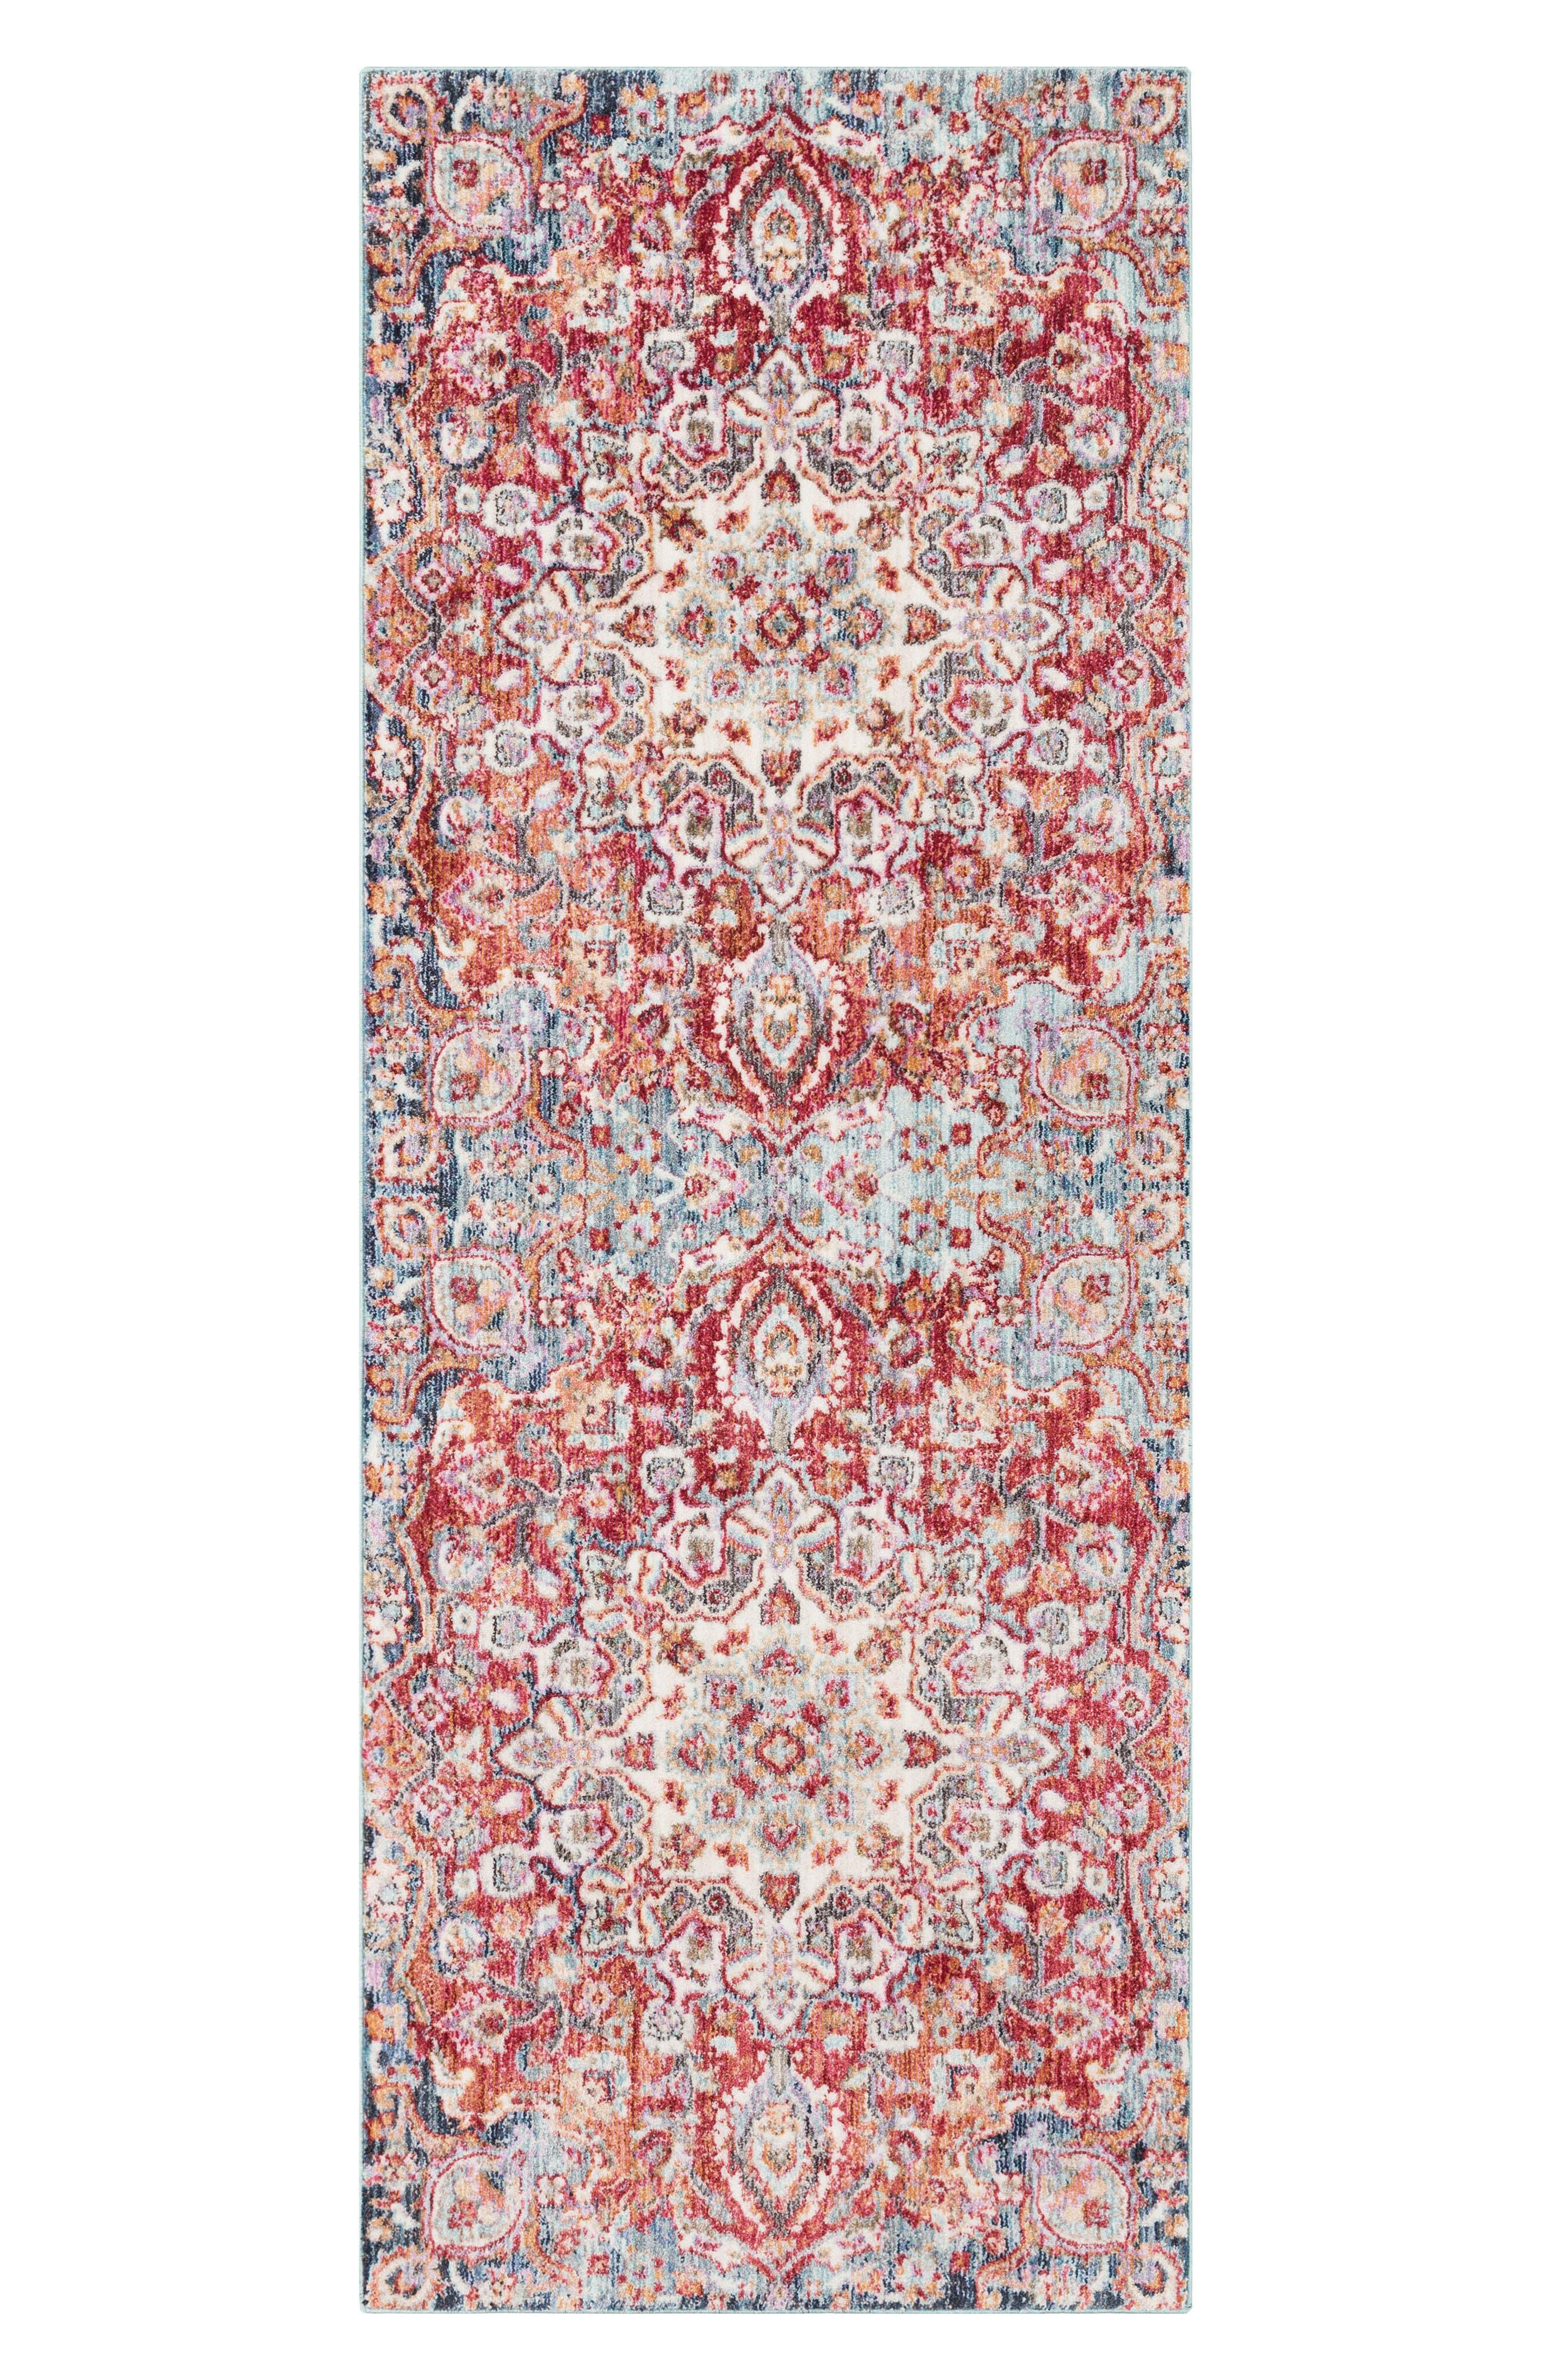 Alternate Image 1 Selected - Surya Home Rumi Area Rug